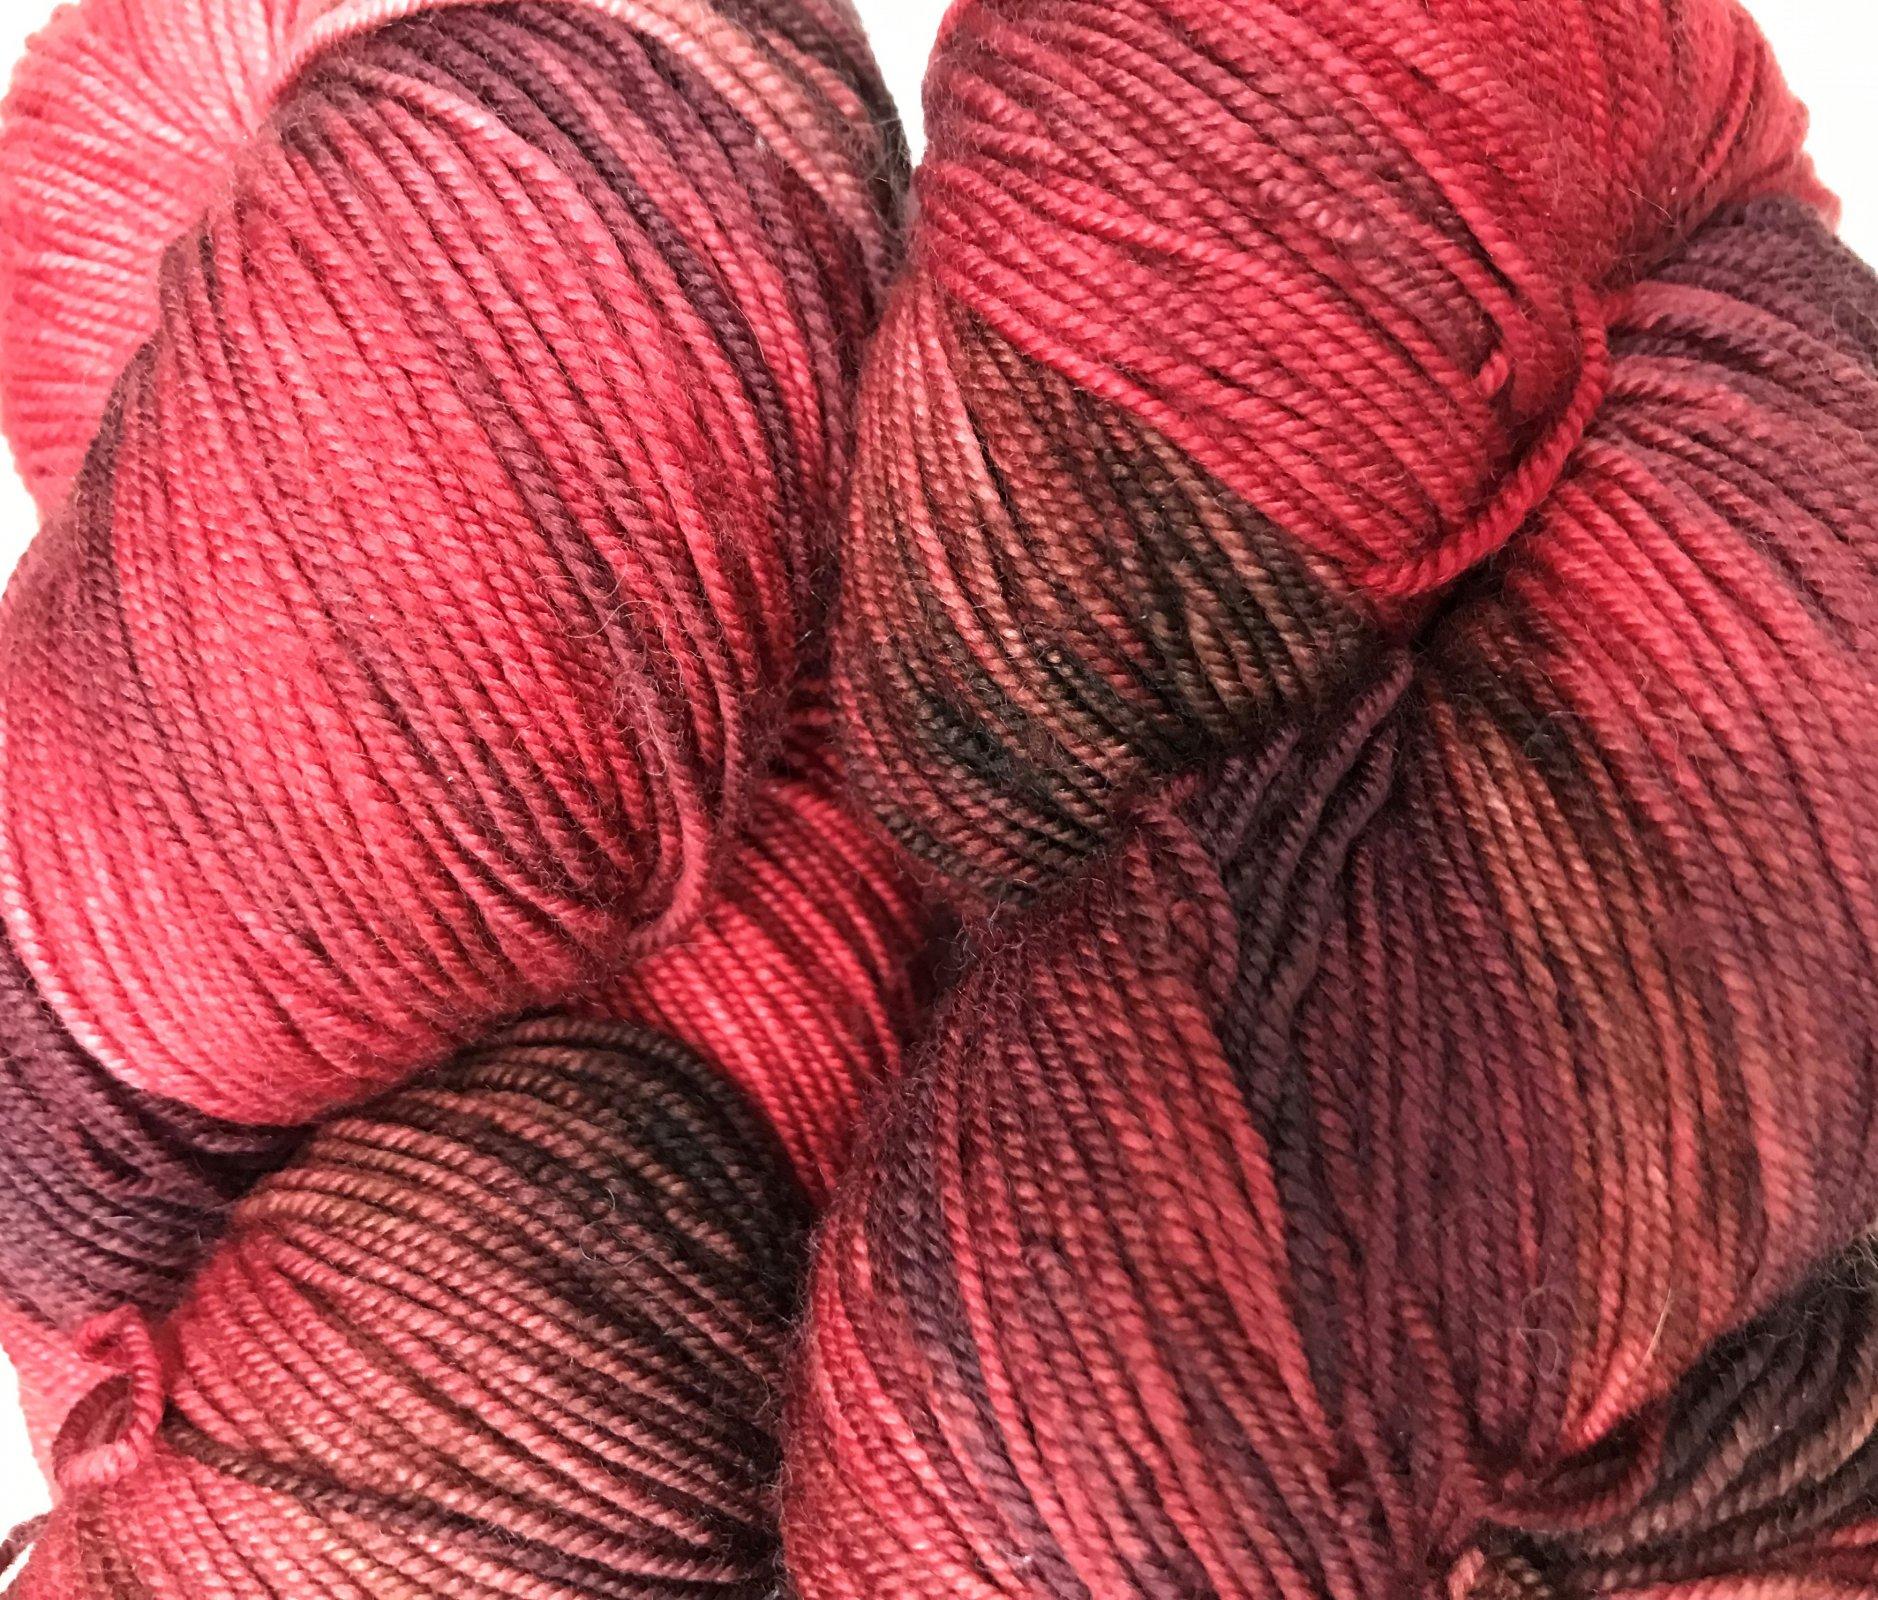 Reds/Black 209, Lace Merino Superwash extra fine 430y, 6.5sts=1on 3US